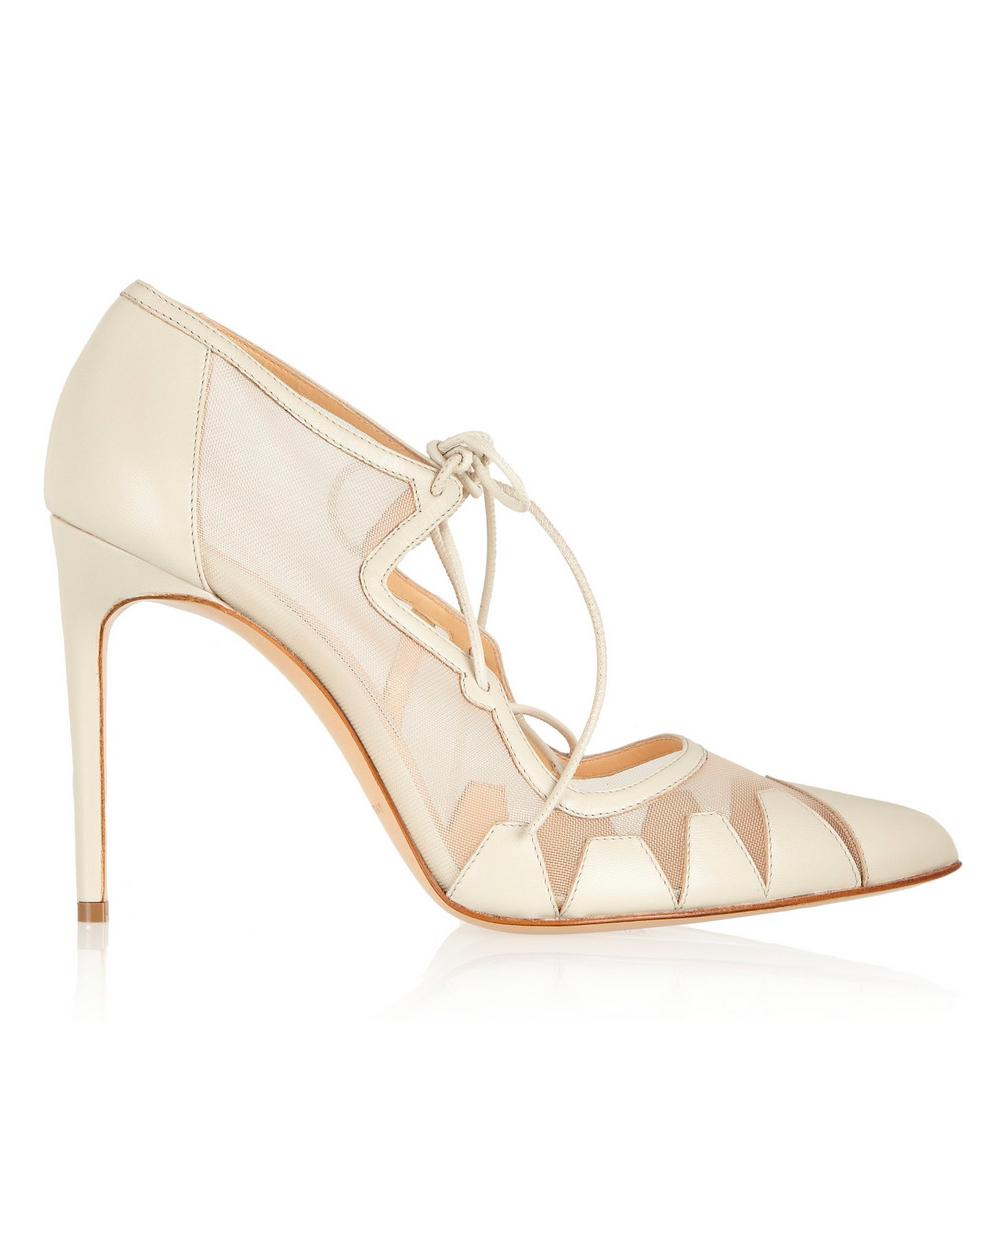 fall-wedding-shoes-bionda-castana-dekota-0914.jpg